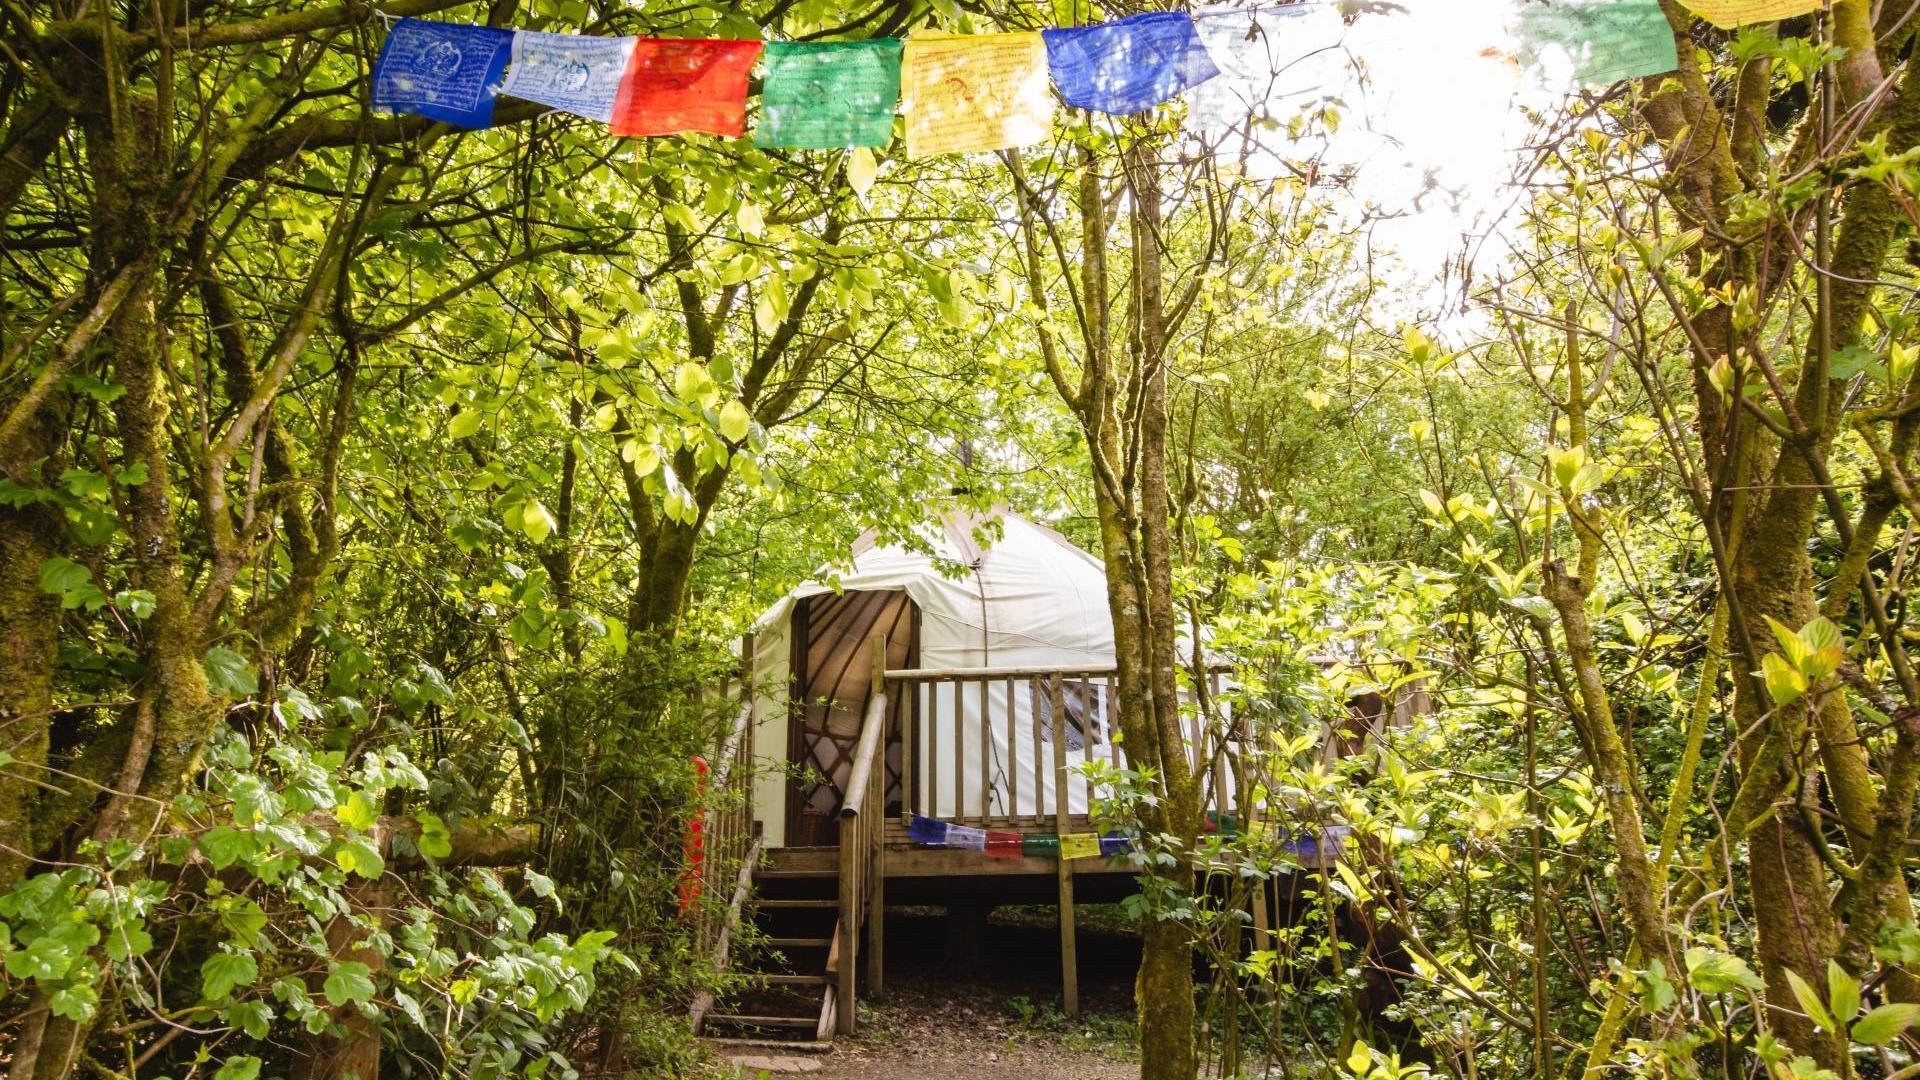 1 Bedroom Yurt in Wales, United Kingdom